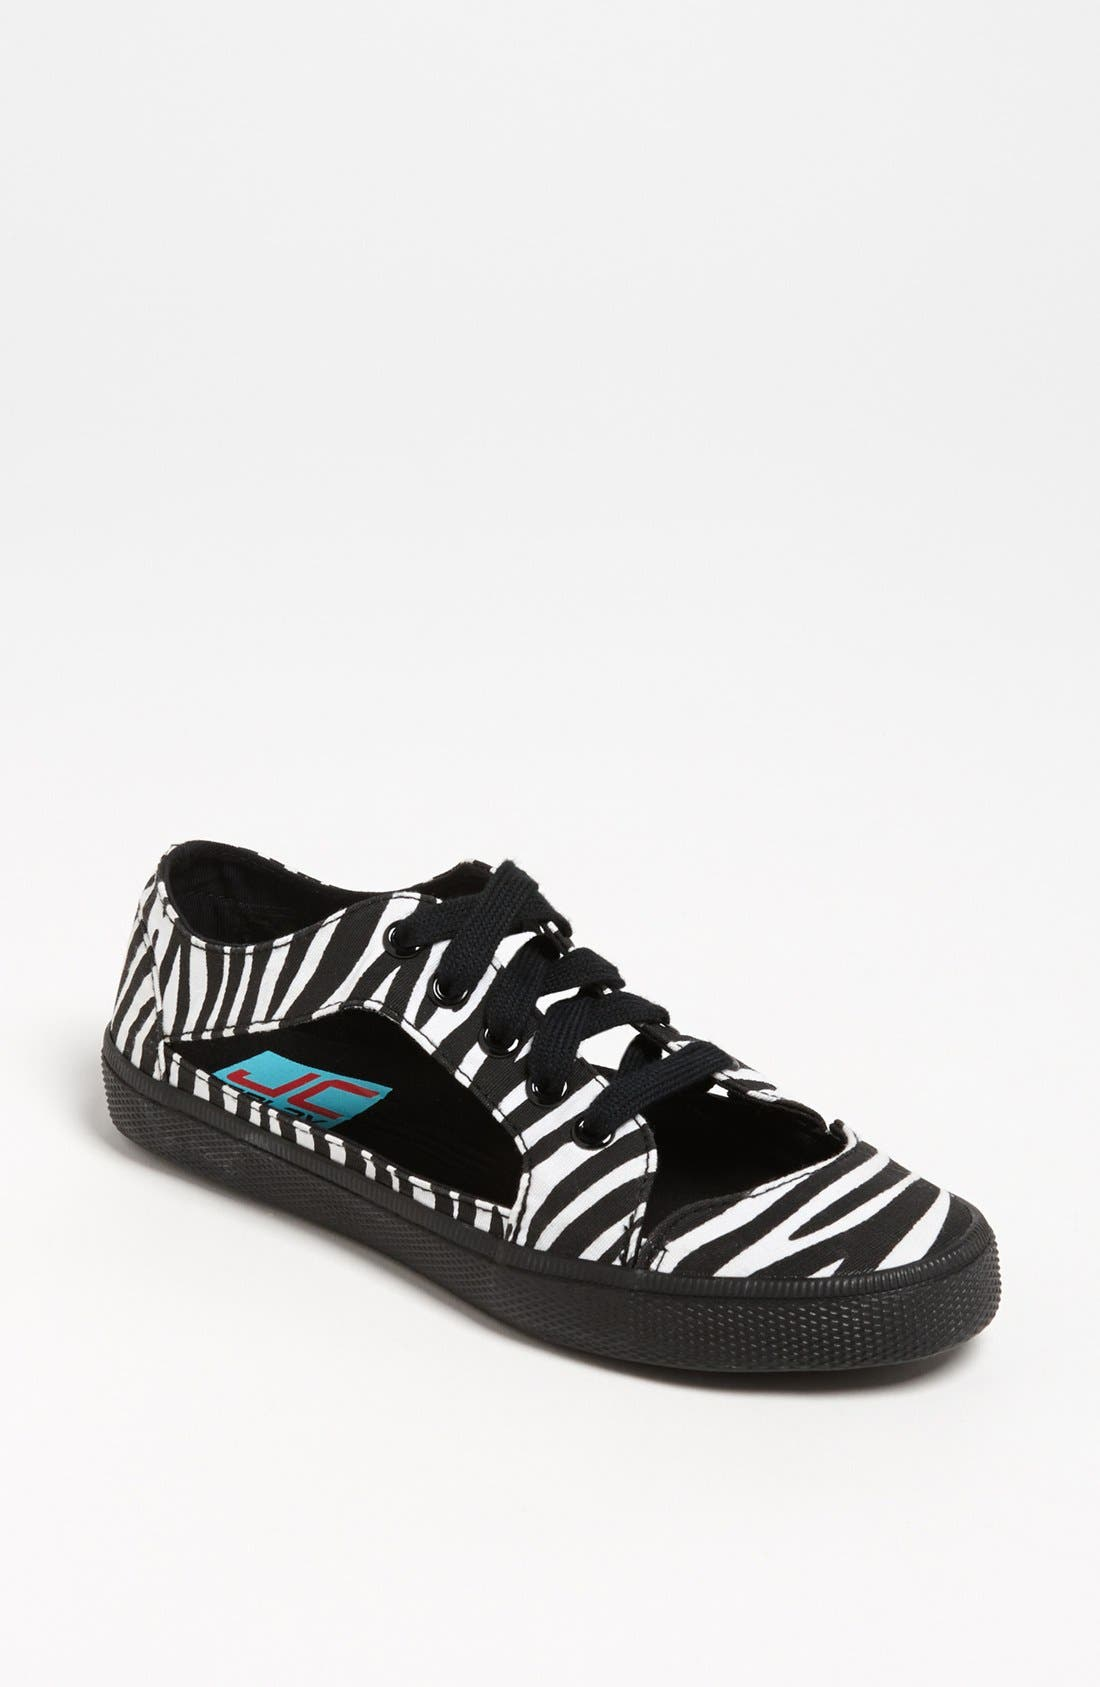 Alternate Image 1 Selected - Jeffrey Campbell 'Lylas' Sneaker